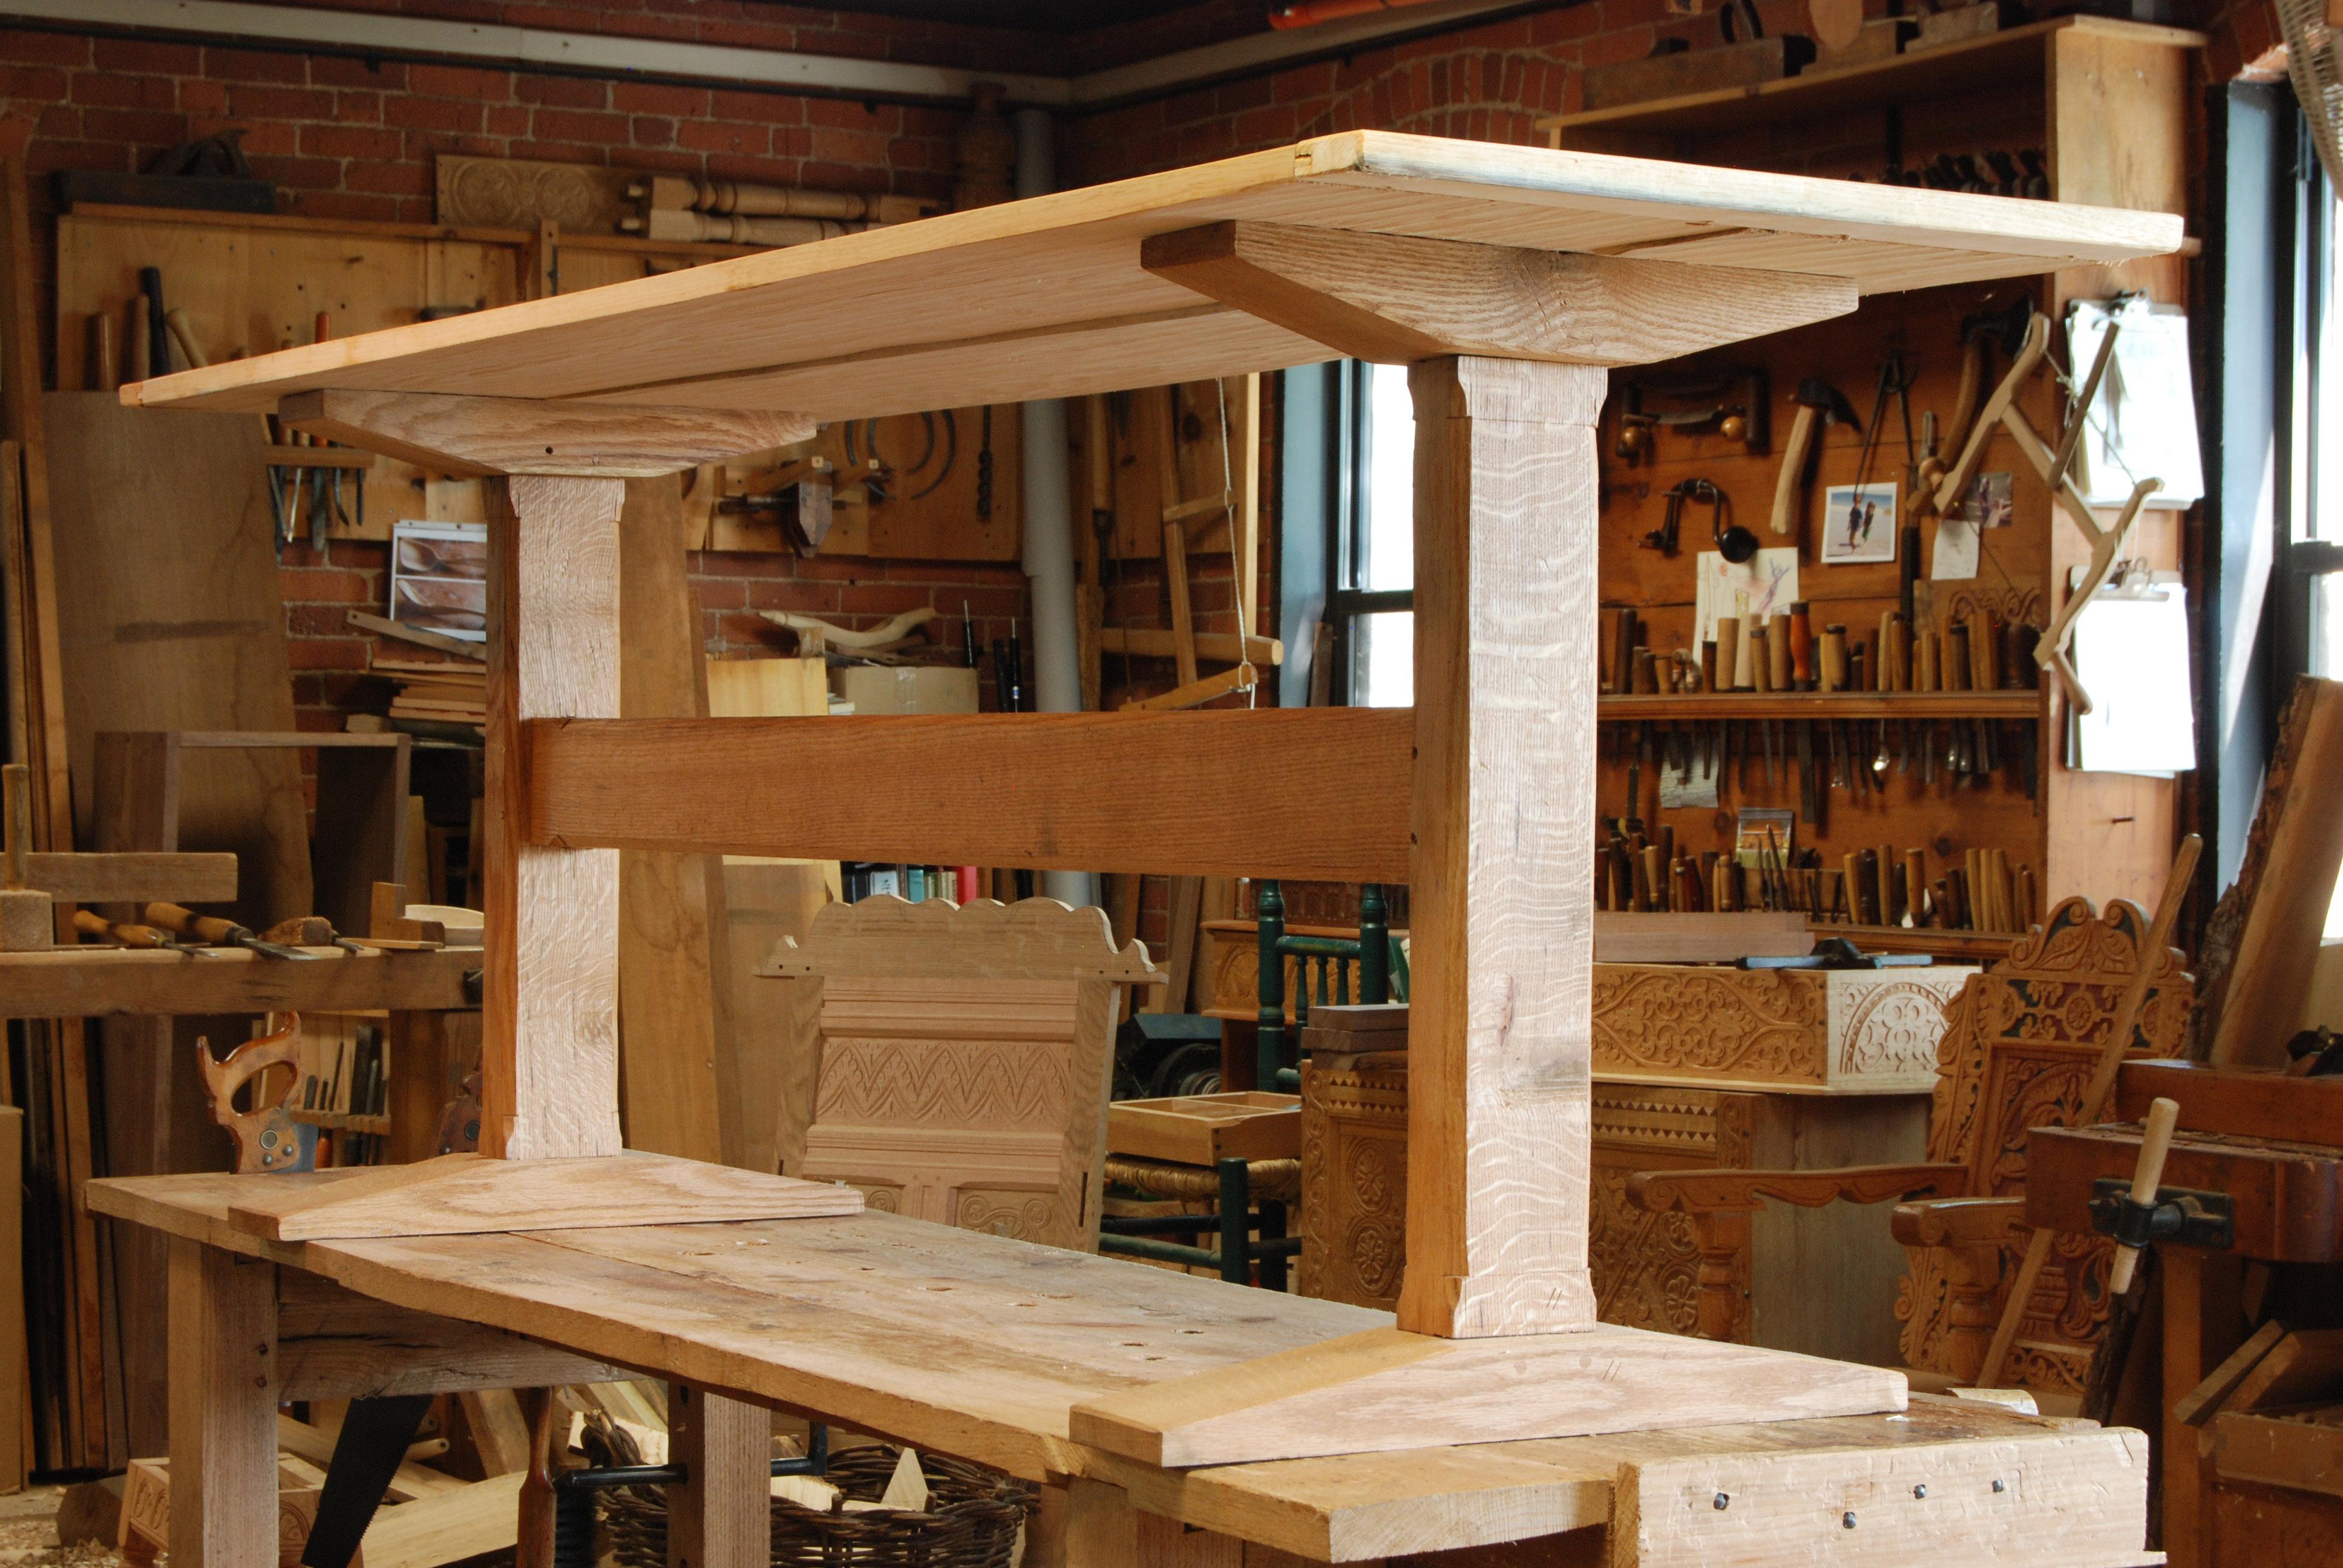 Trestle Table Bench Plans